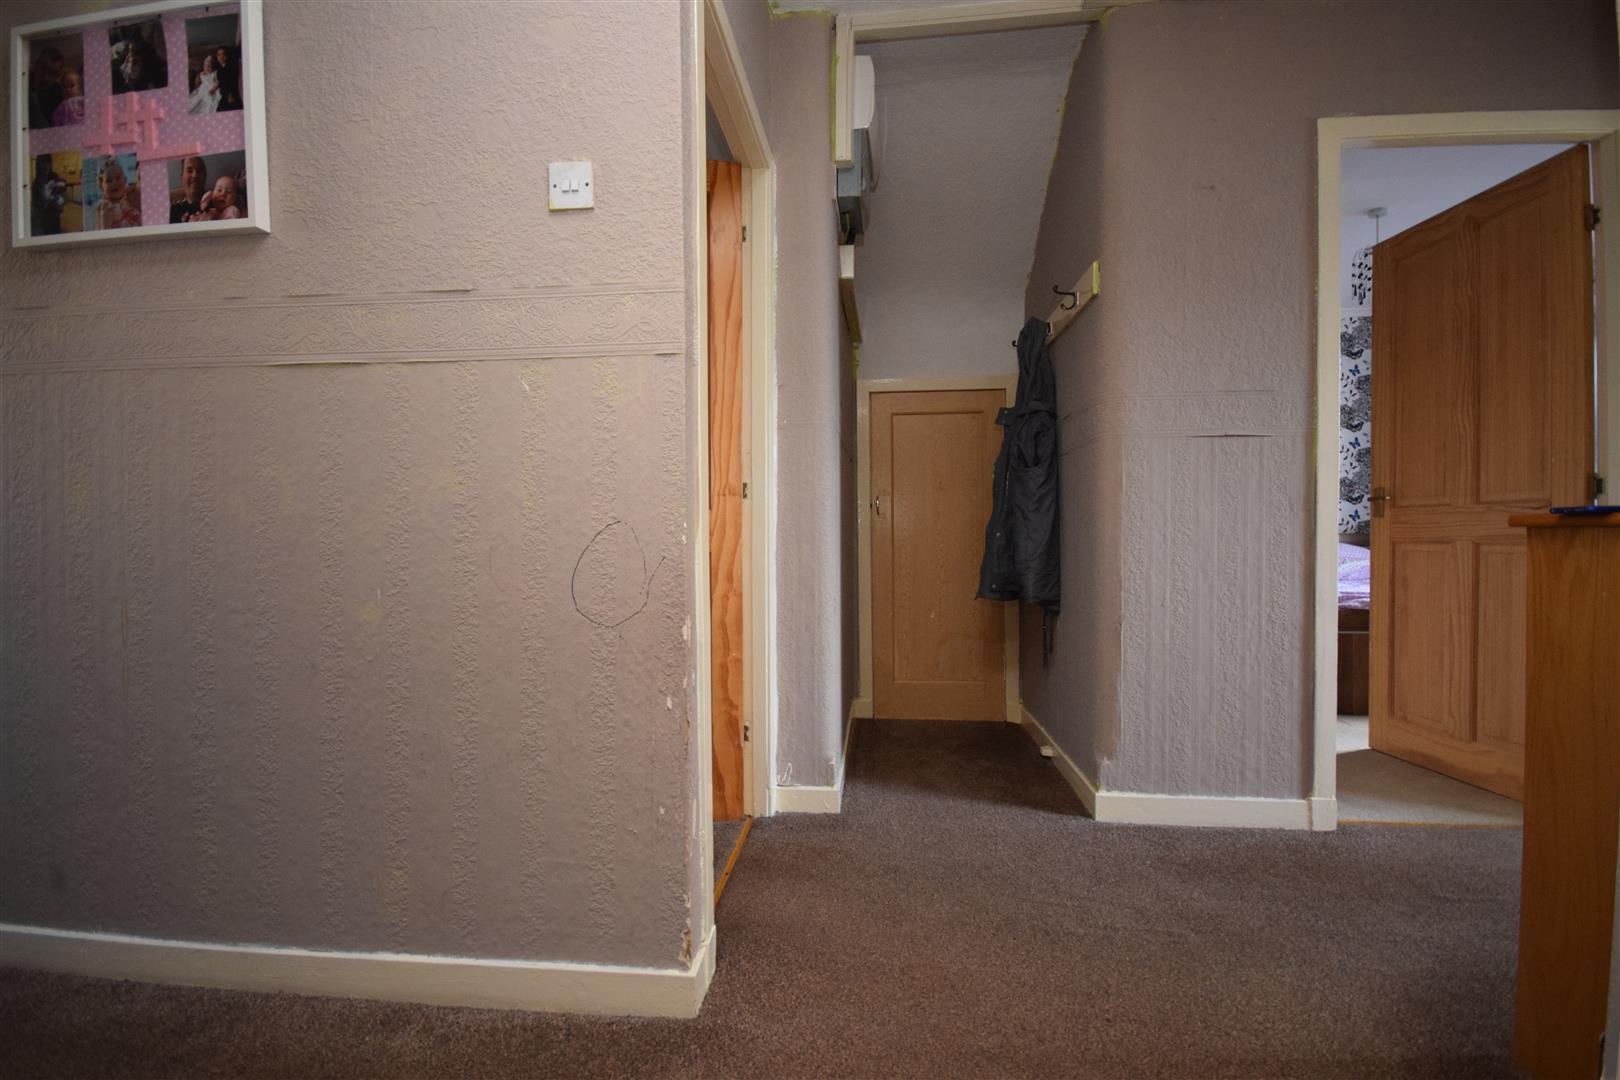 109, Kingswell Terrace, Perth, Perthshire, PH1 2DA, UK